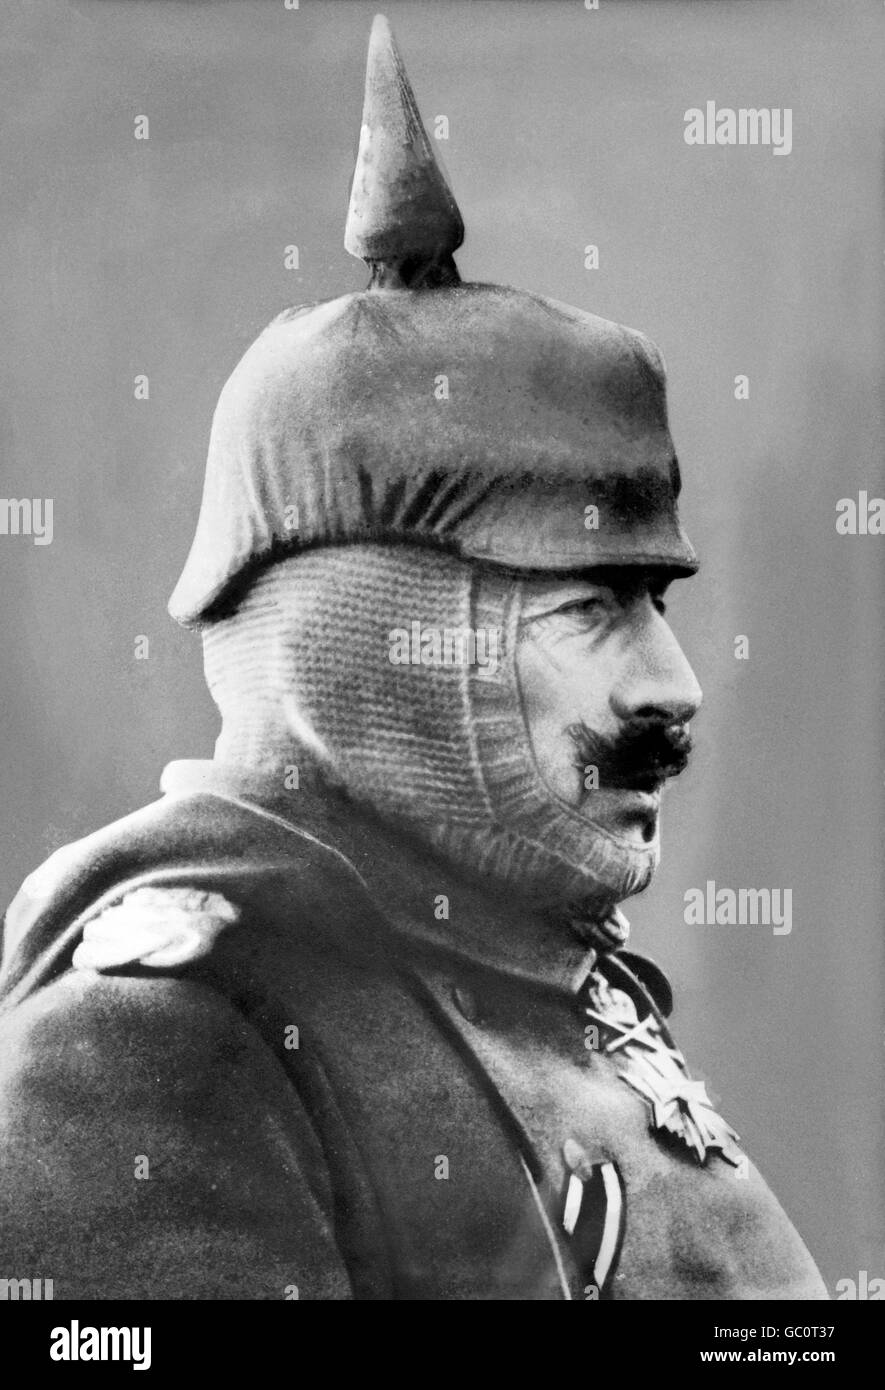 Kaiser Wilhelm II. Portrait of Kaiser Wilhelm II (1859-1941), Emperor of Germany and King of Prussia, wearing field - Stock Image